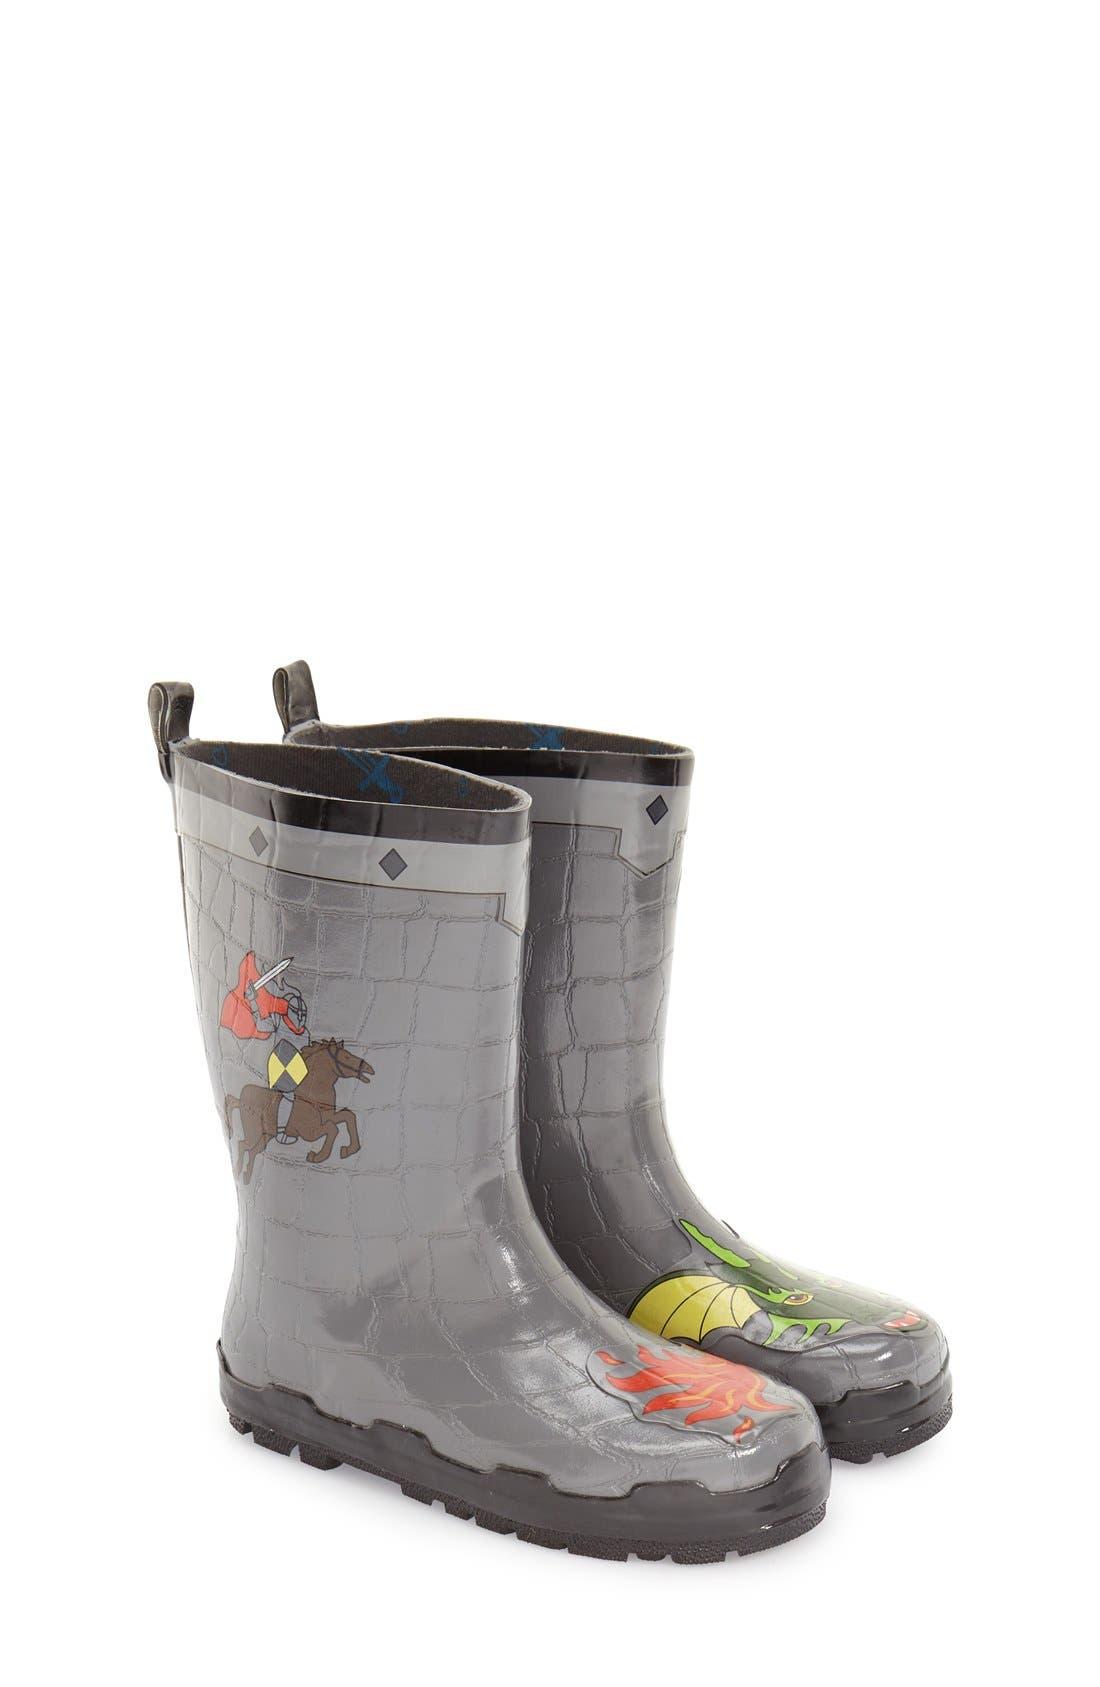 KIDORABLE Dragon Knight Waterproof Rain Boot